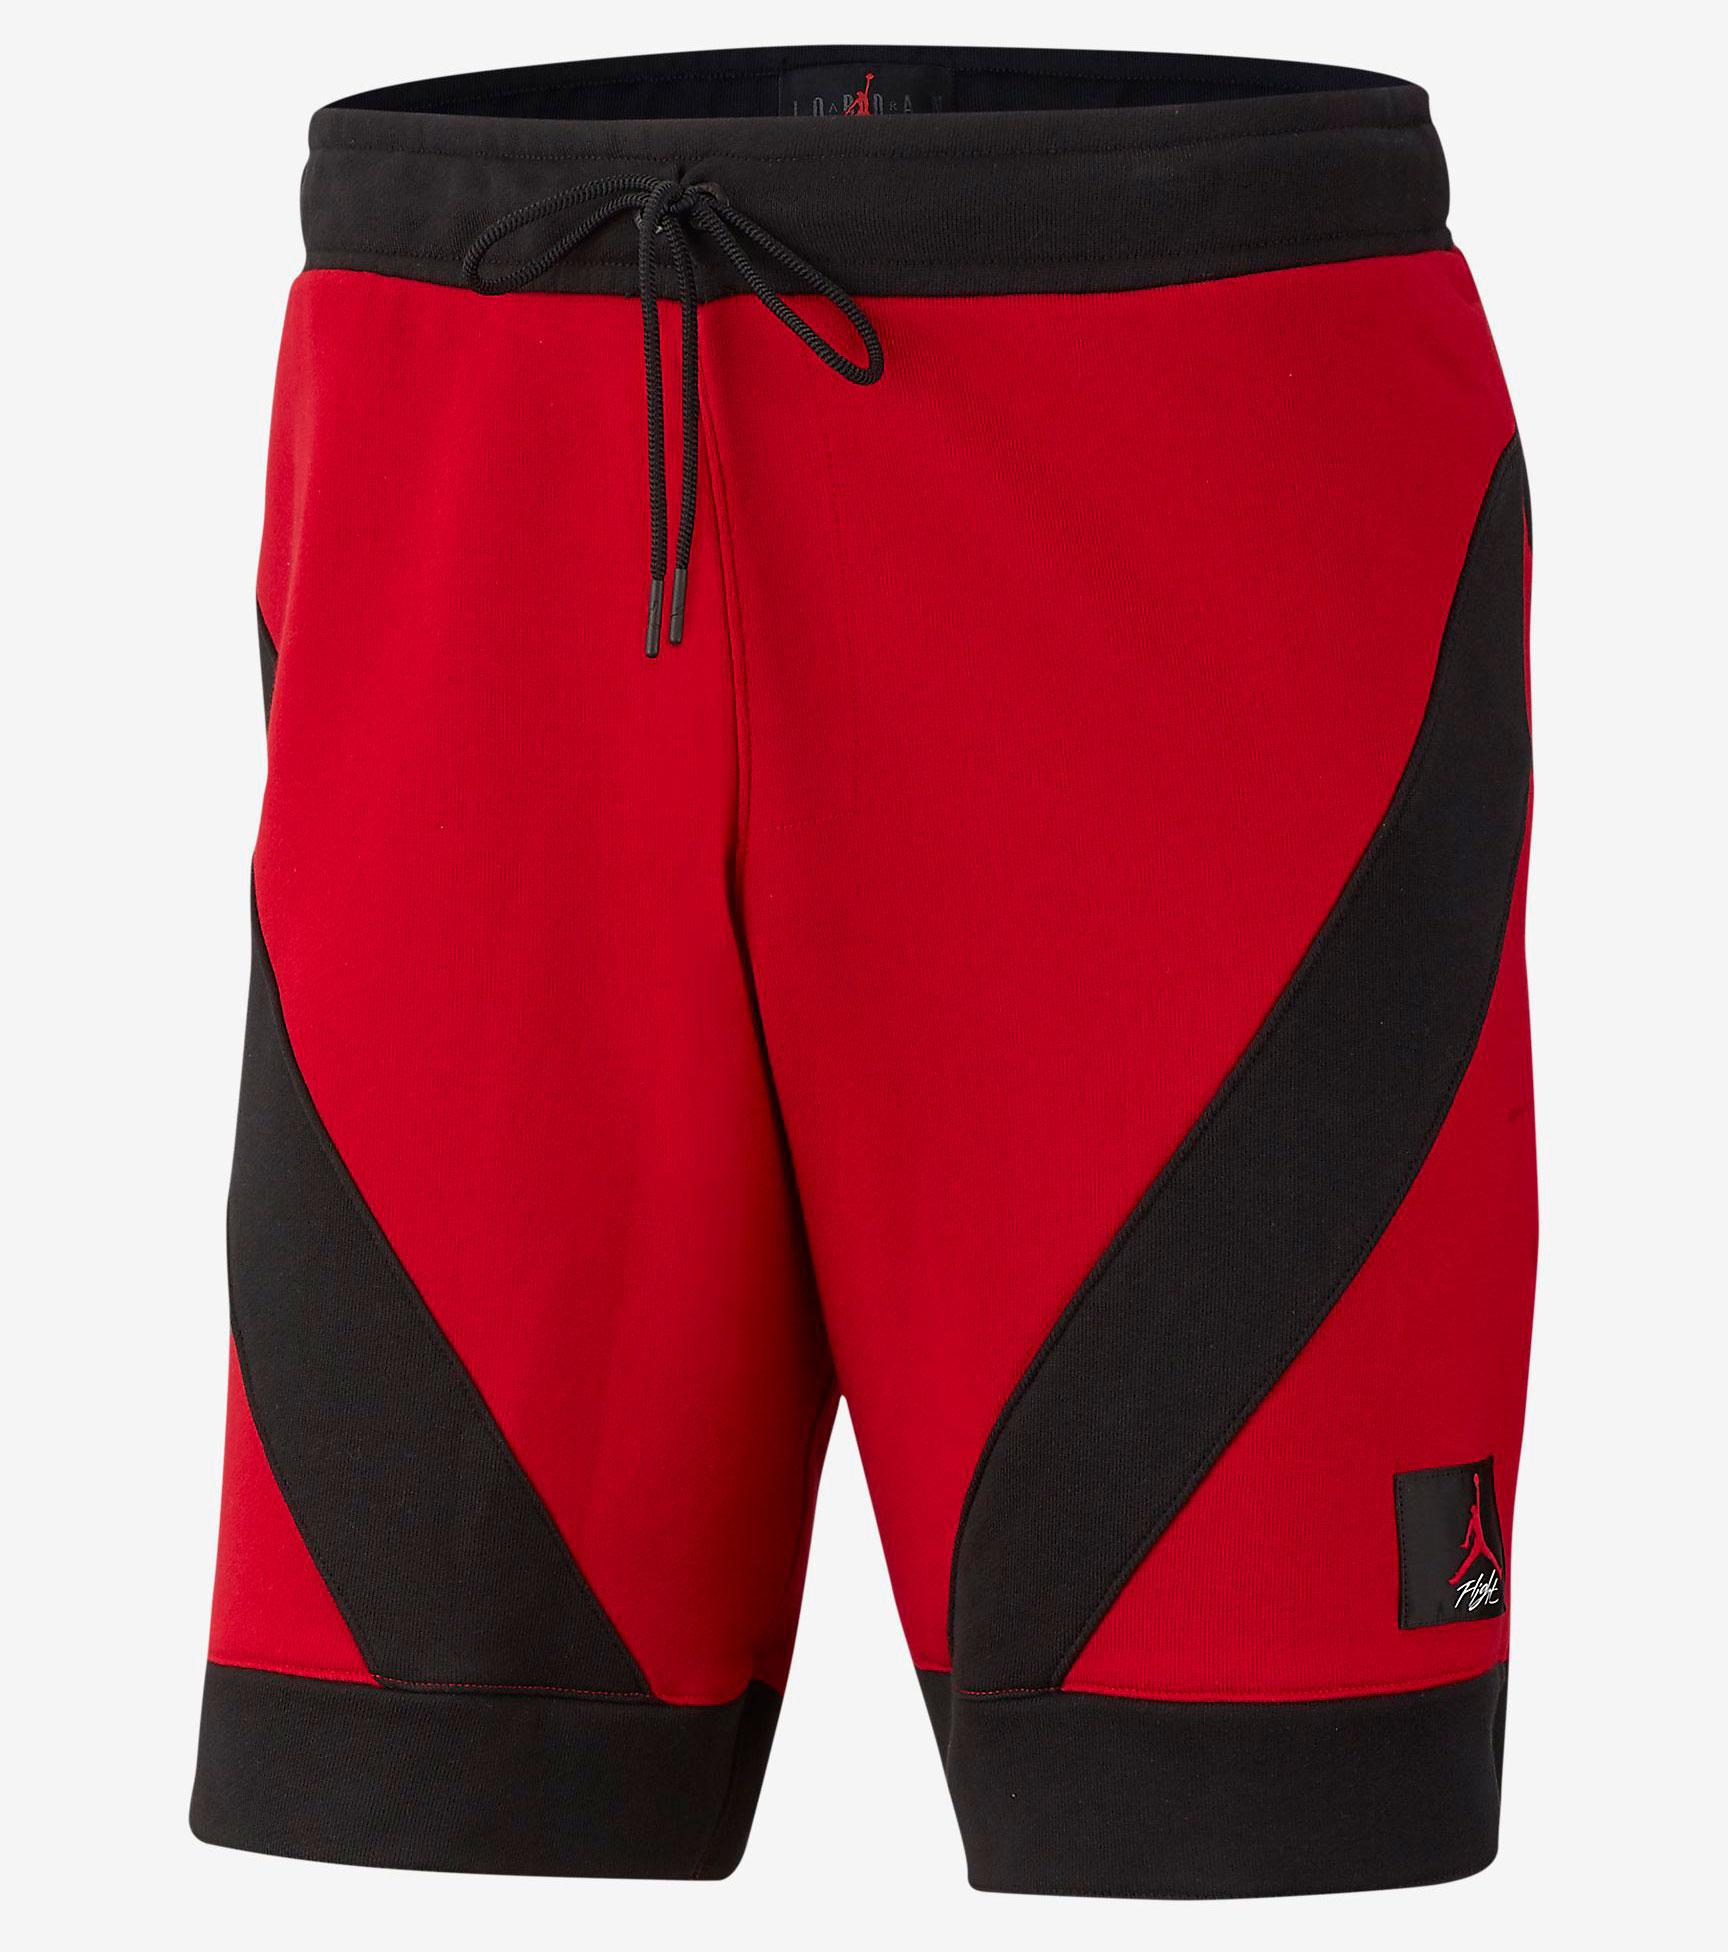 jordan-14-candy-cane-rip-hamilton-shorts-match-1